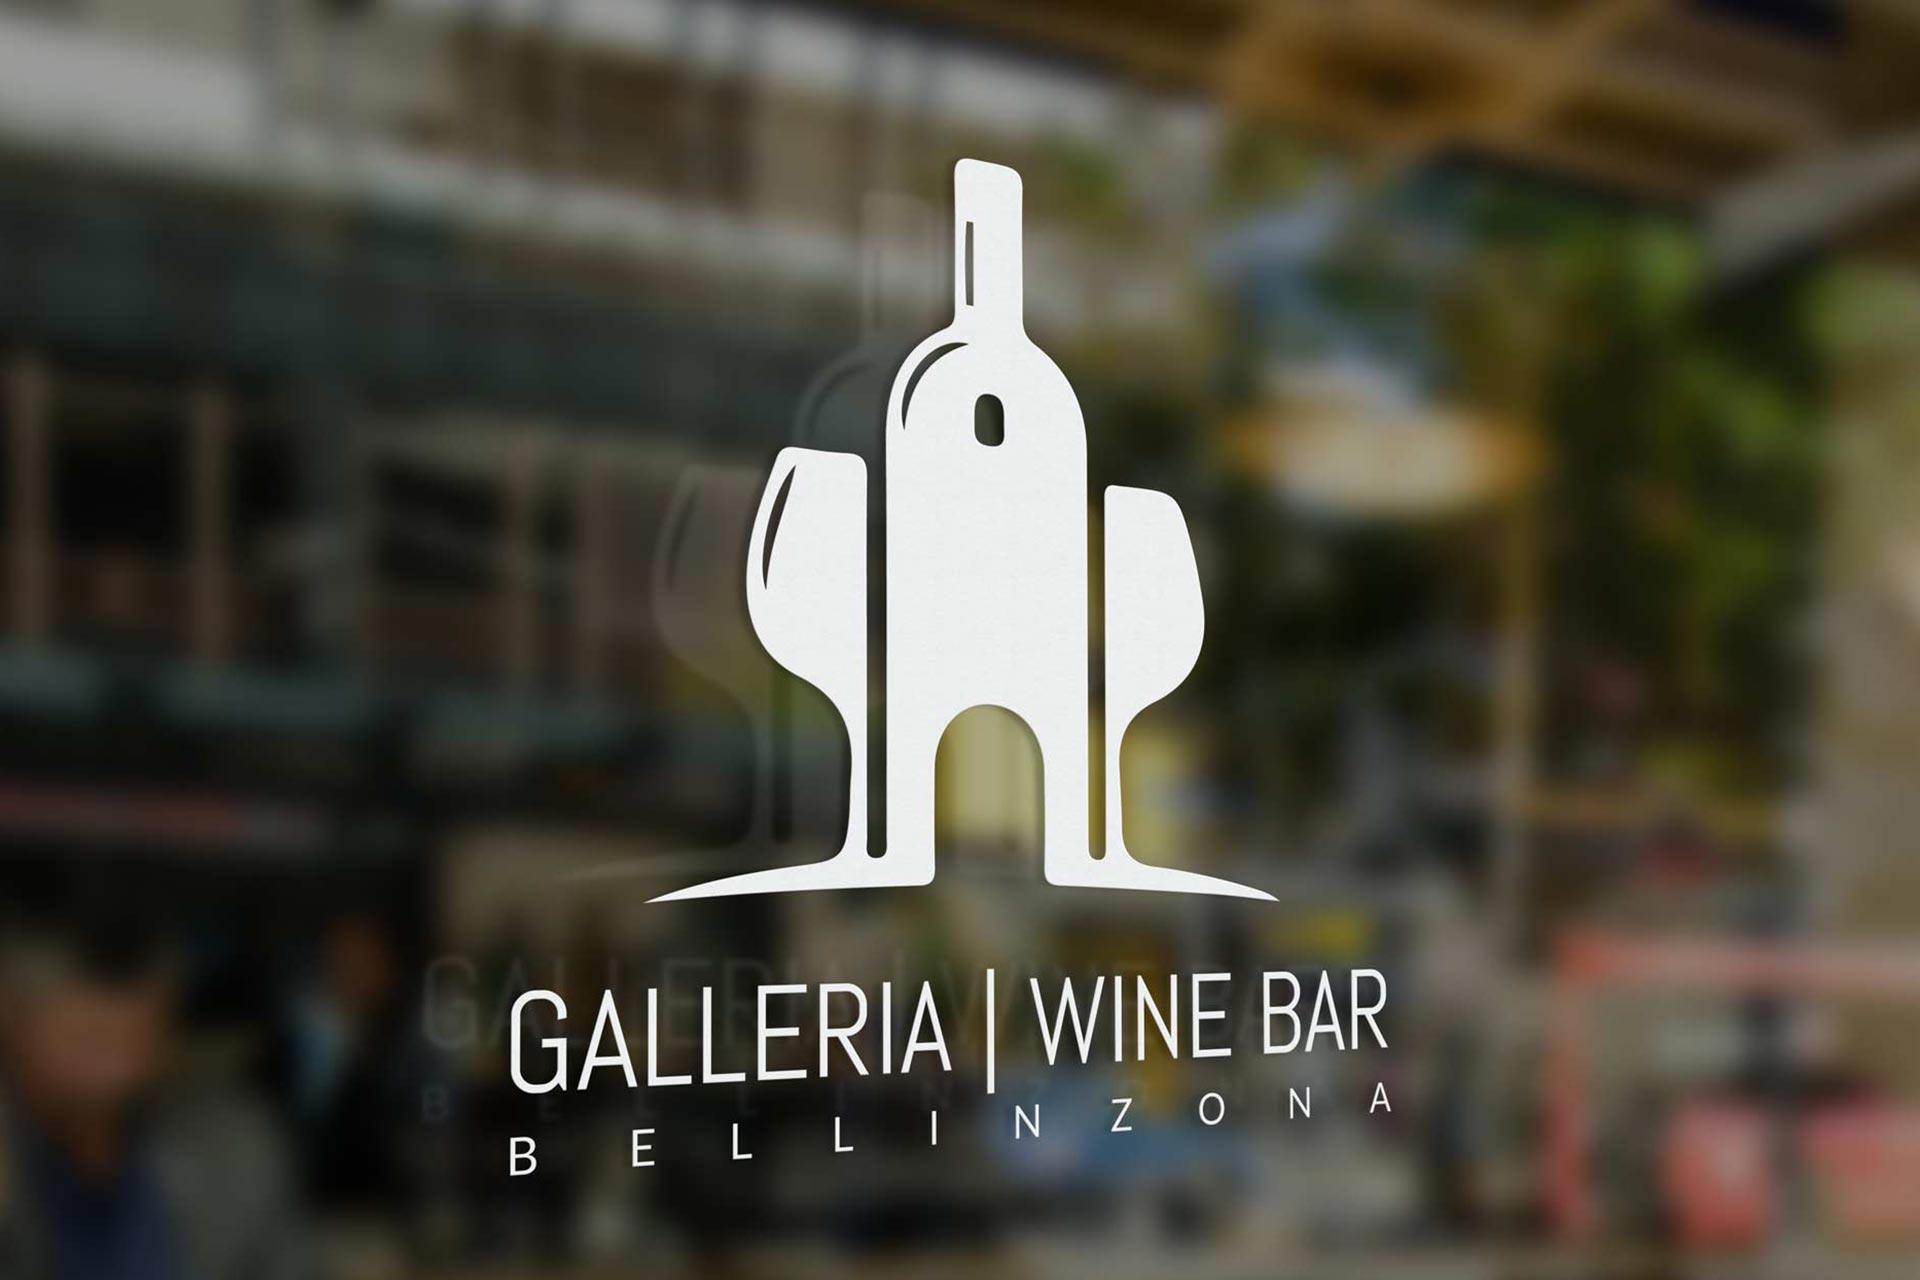 galleria-winebar-bellinzona-vetrofania-1